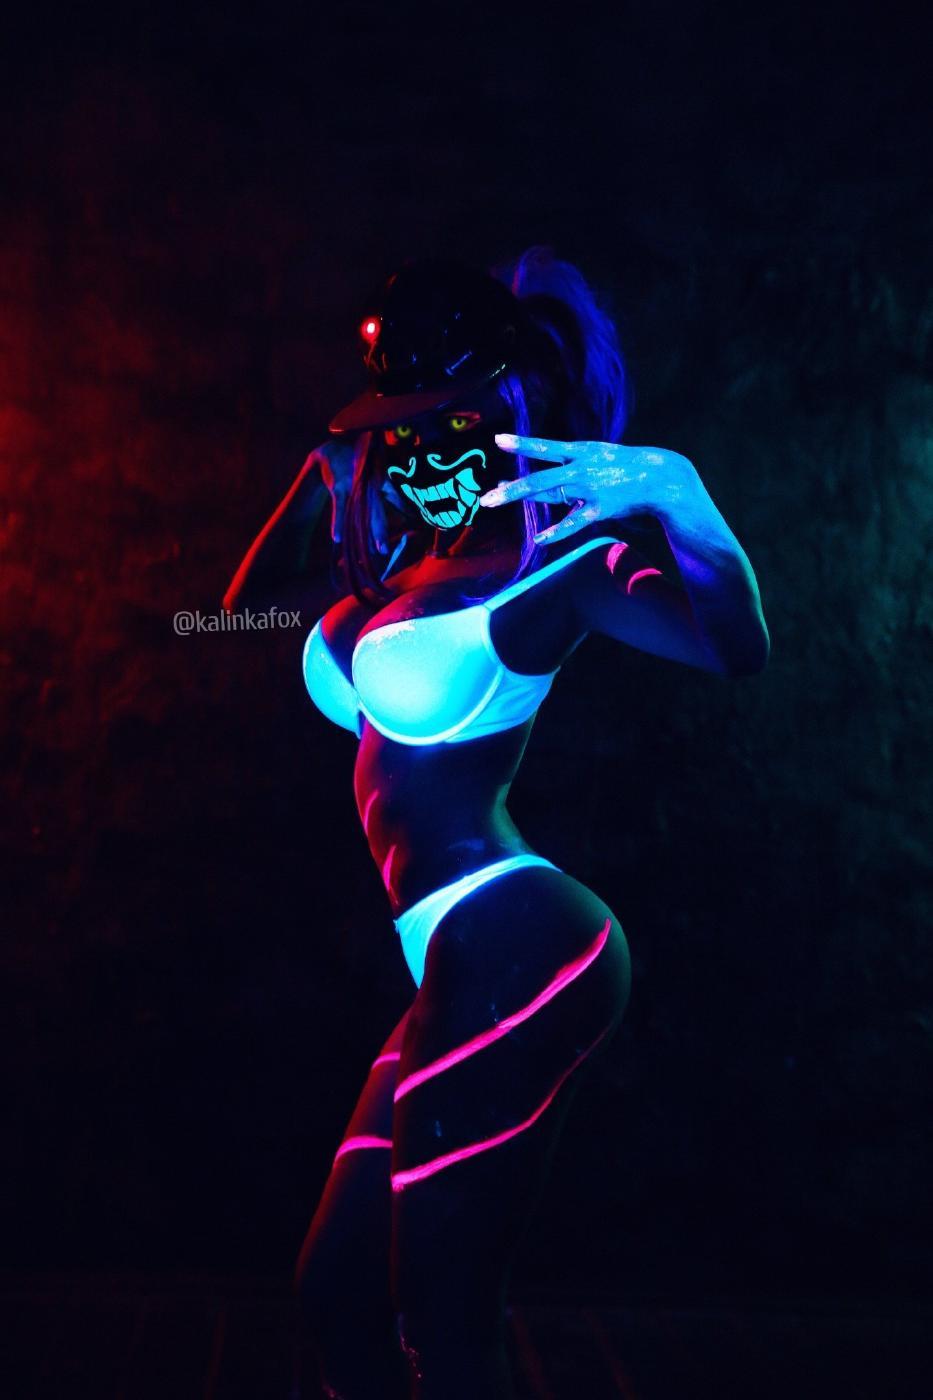 Kalinka Fox Nude Akali Cosplay Leaked 32